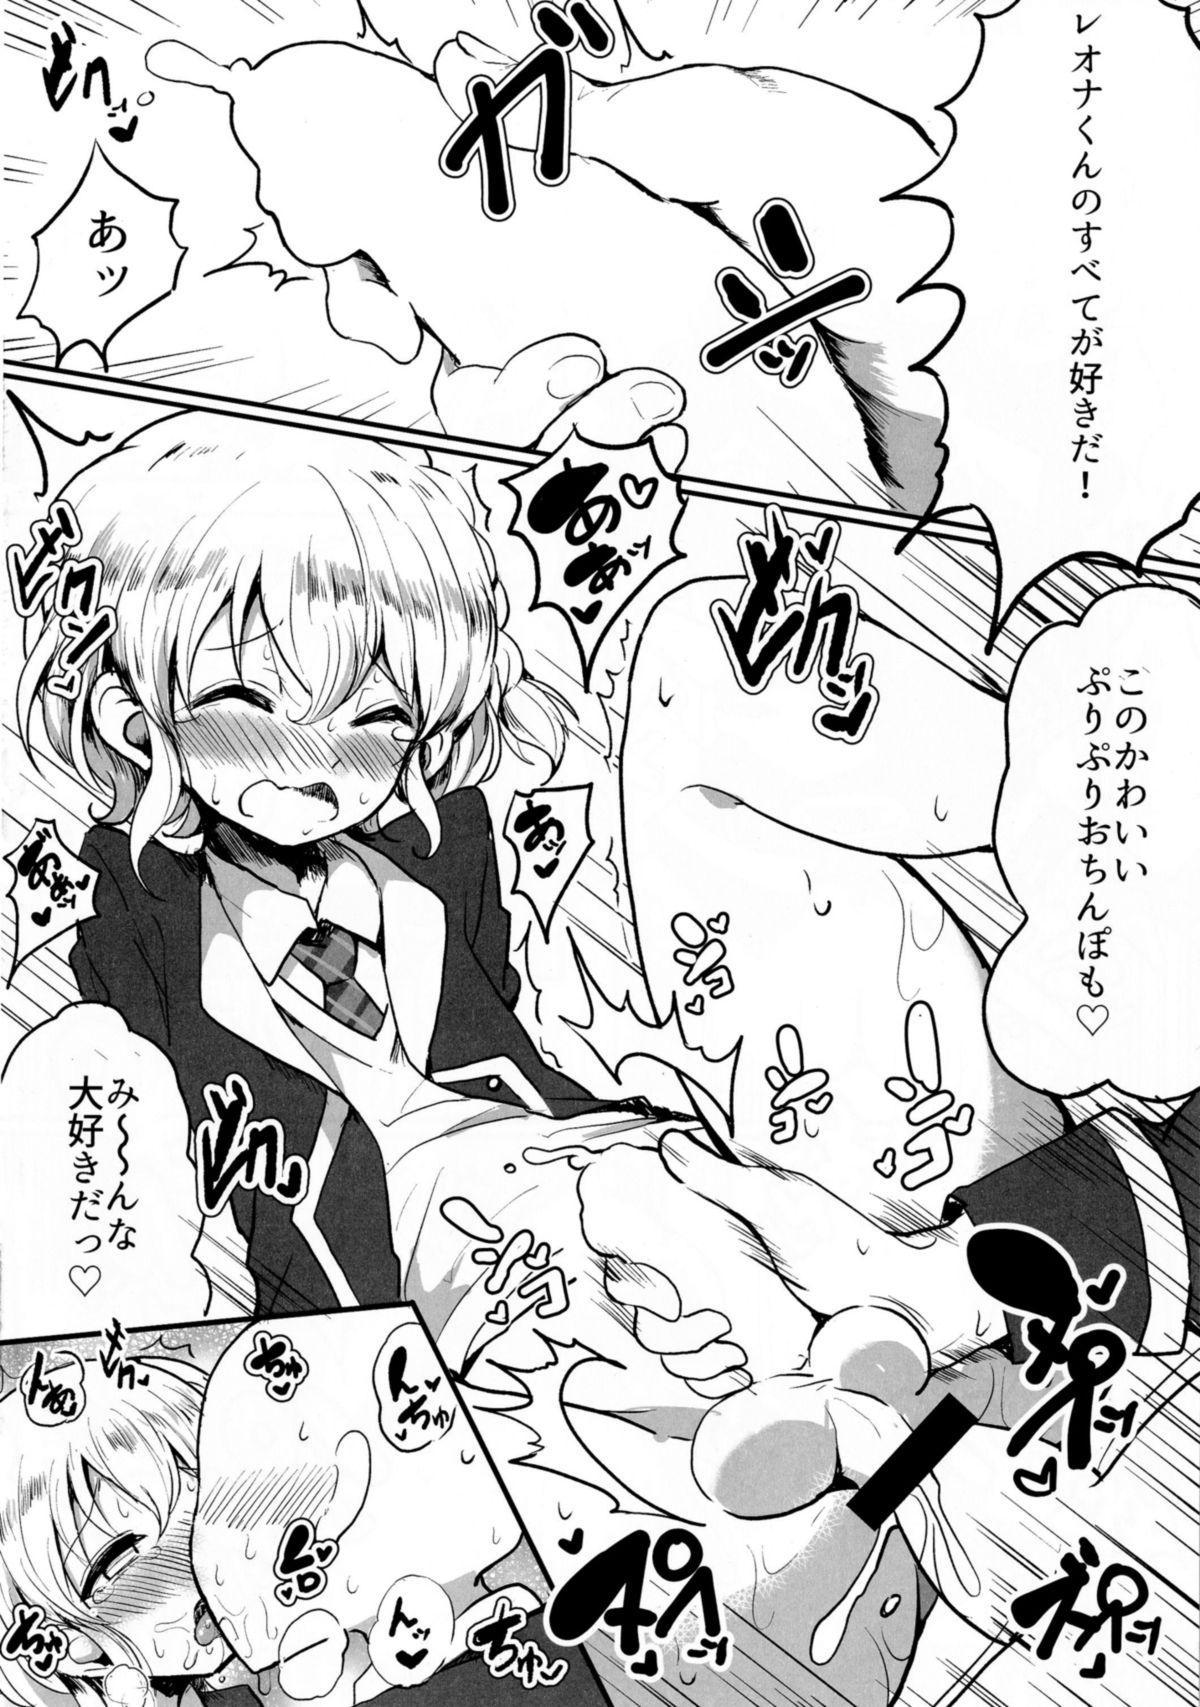 Suki suki daisuki Reona-kun2 24